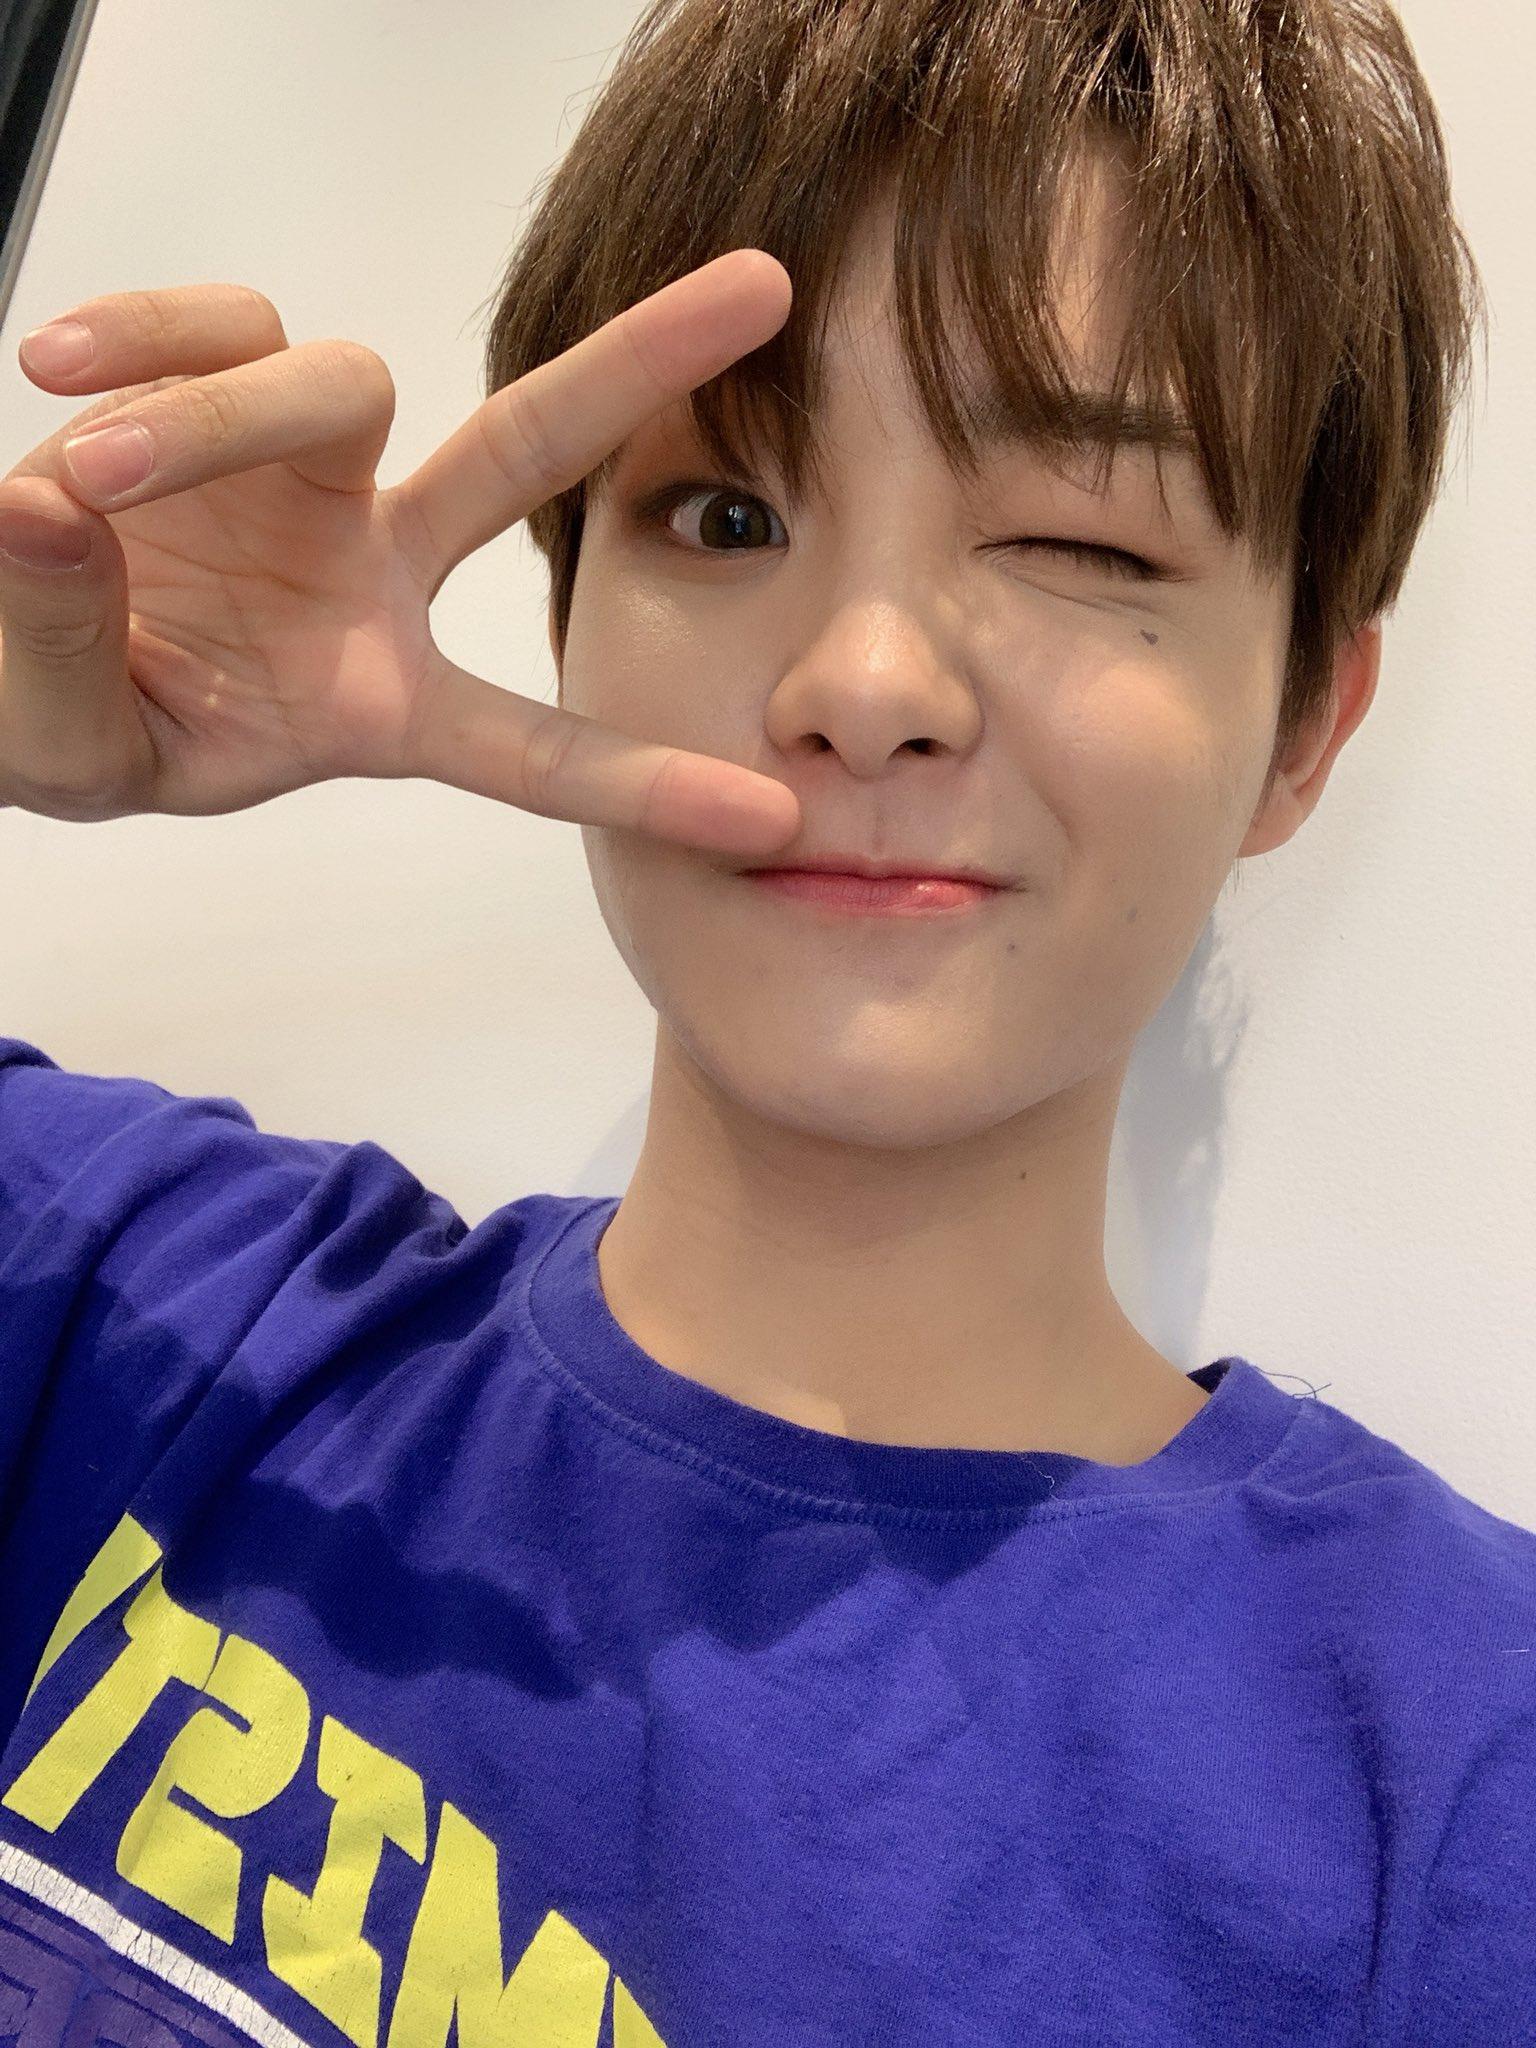 jihoon now